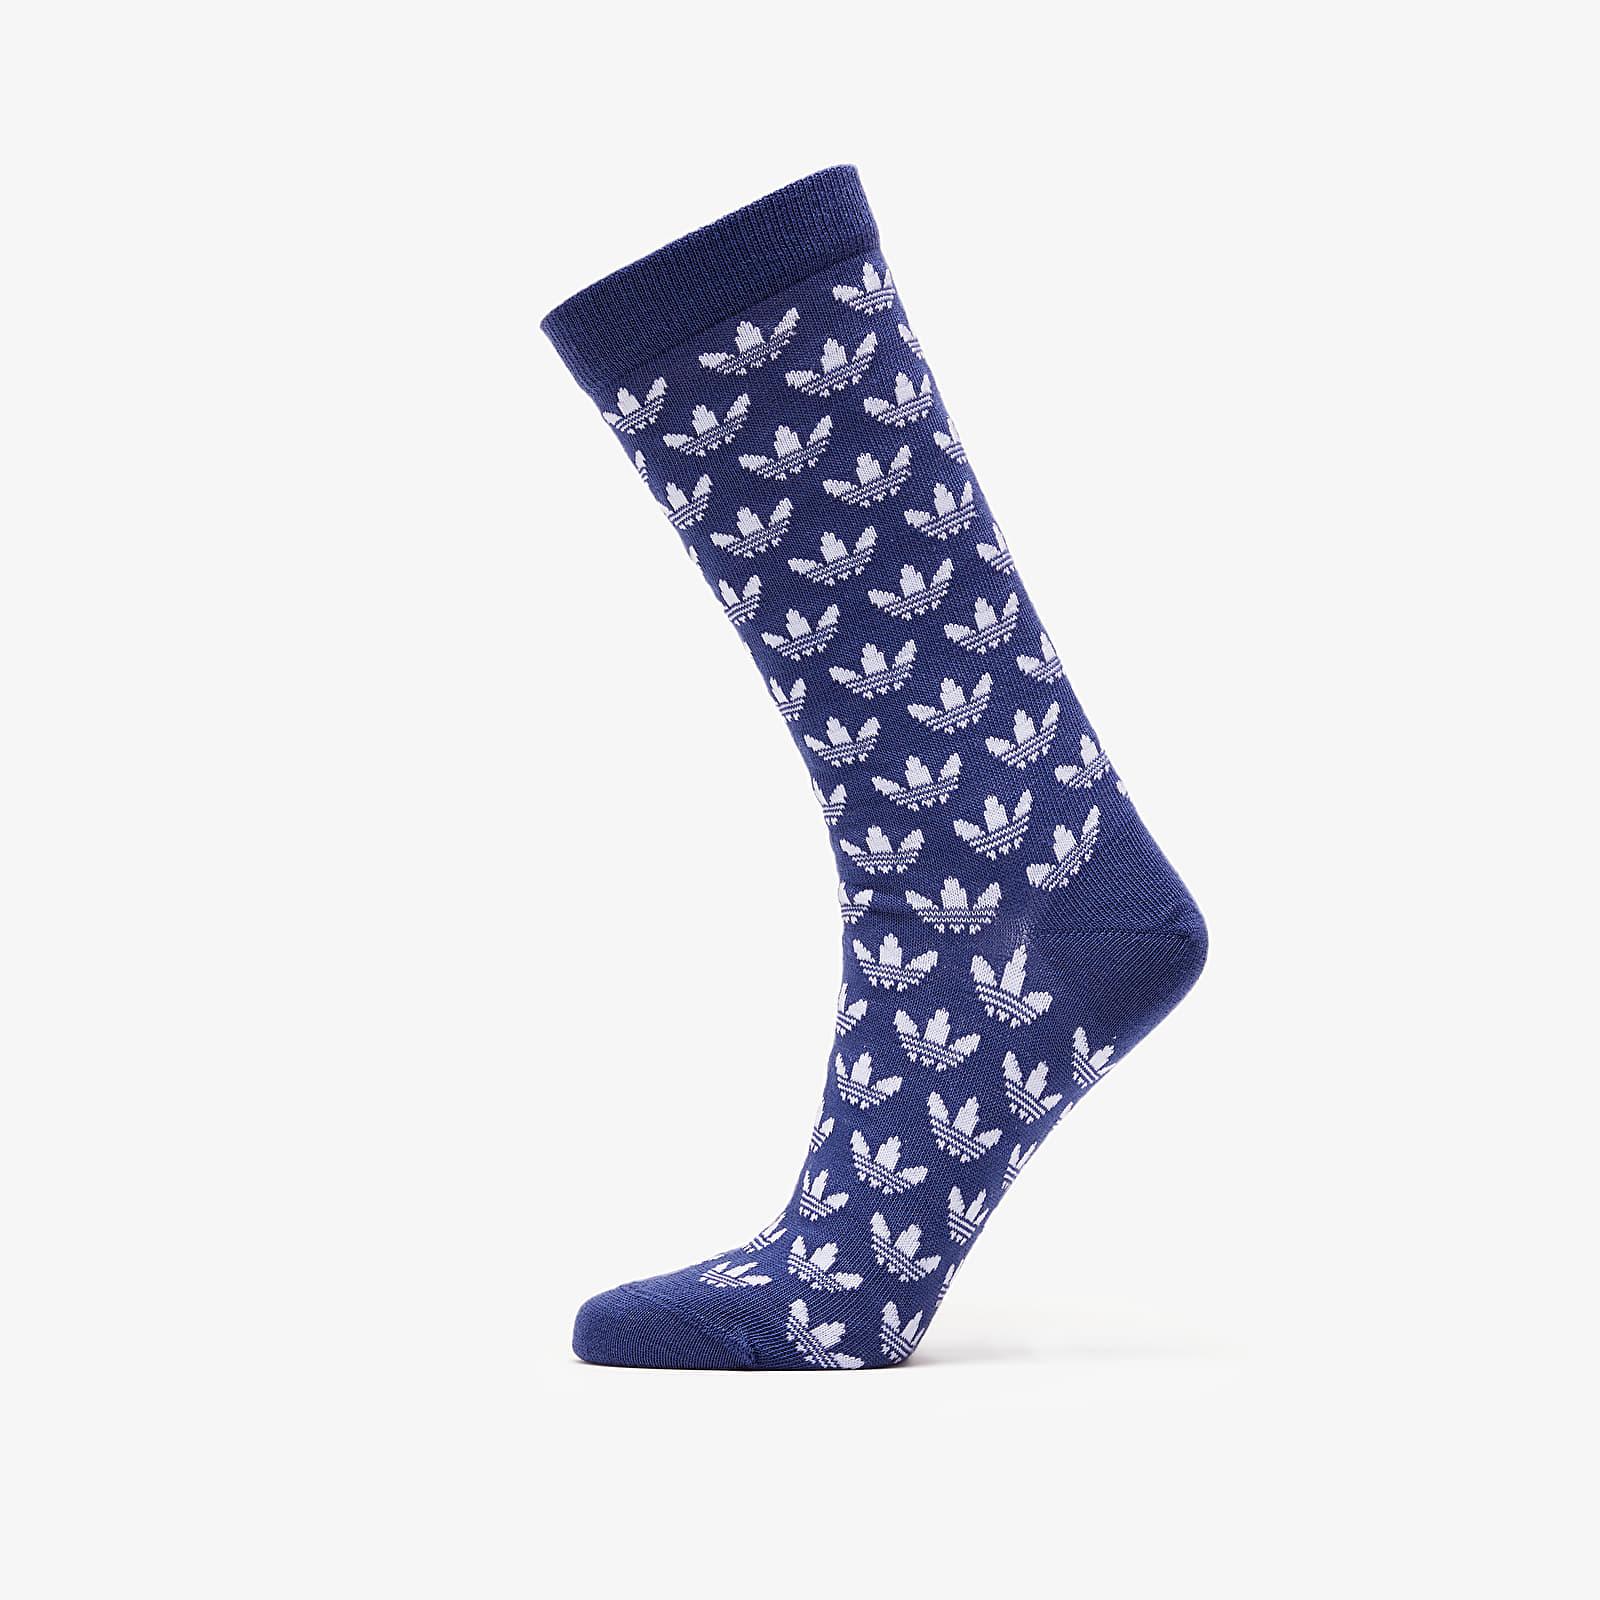 обычные носки adidas 2 Pack Thin Crew Socks Sky Tint/ White